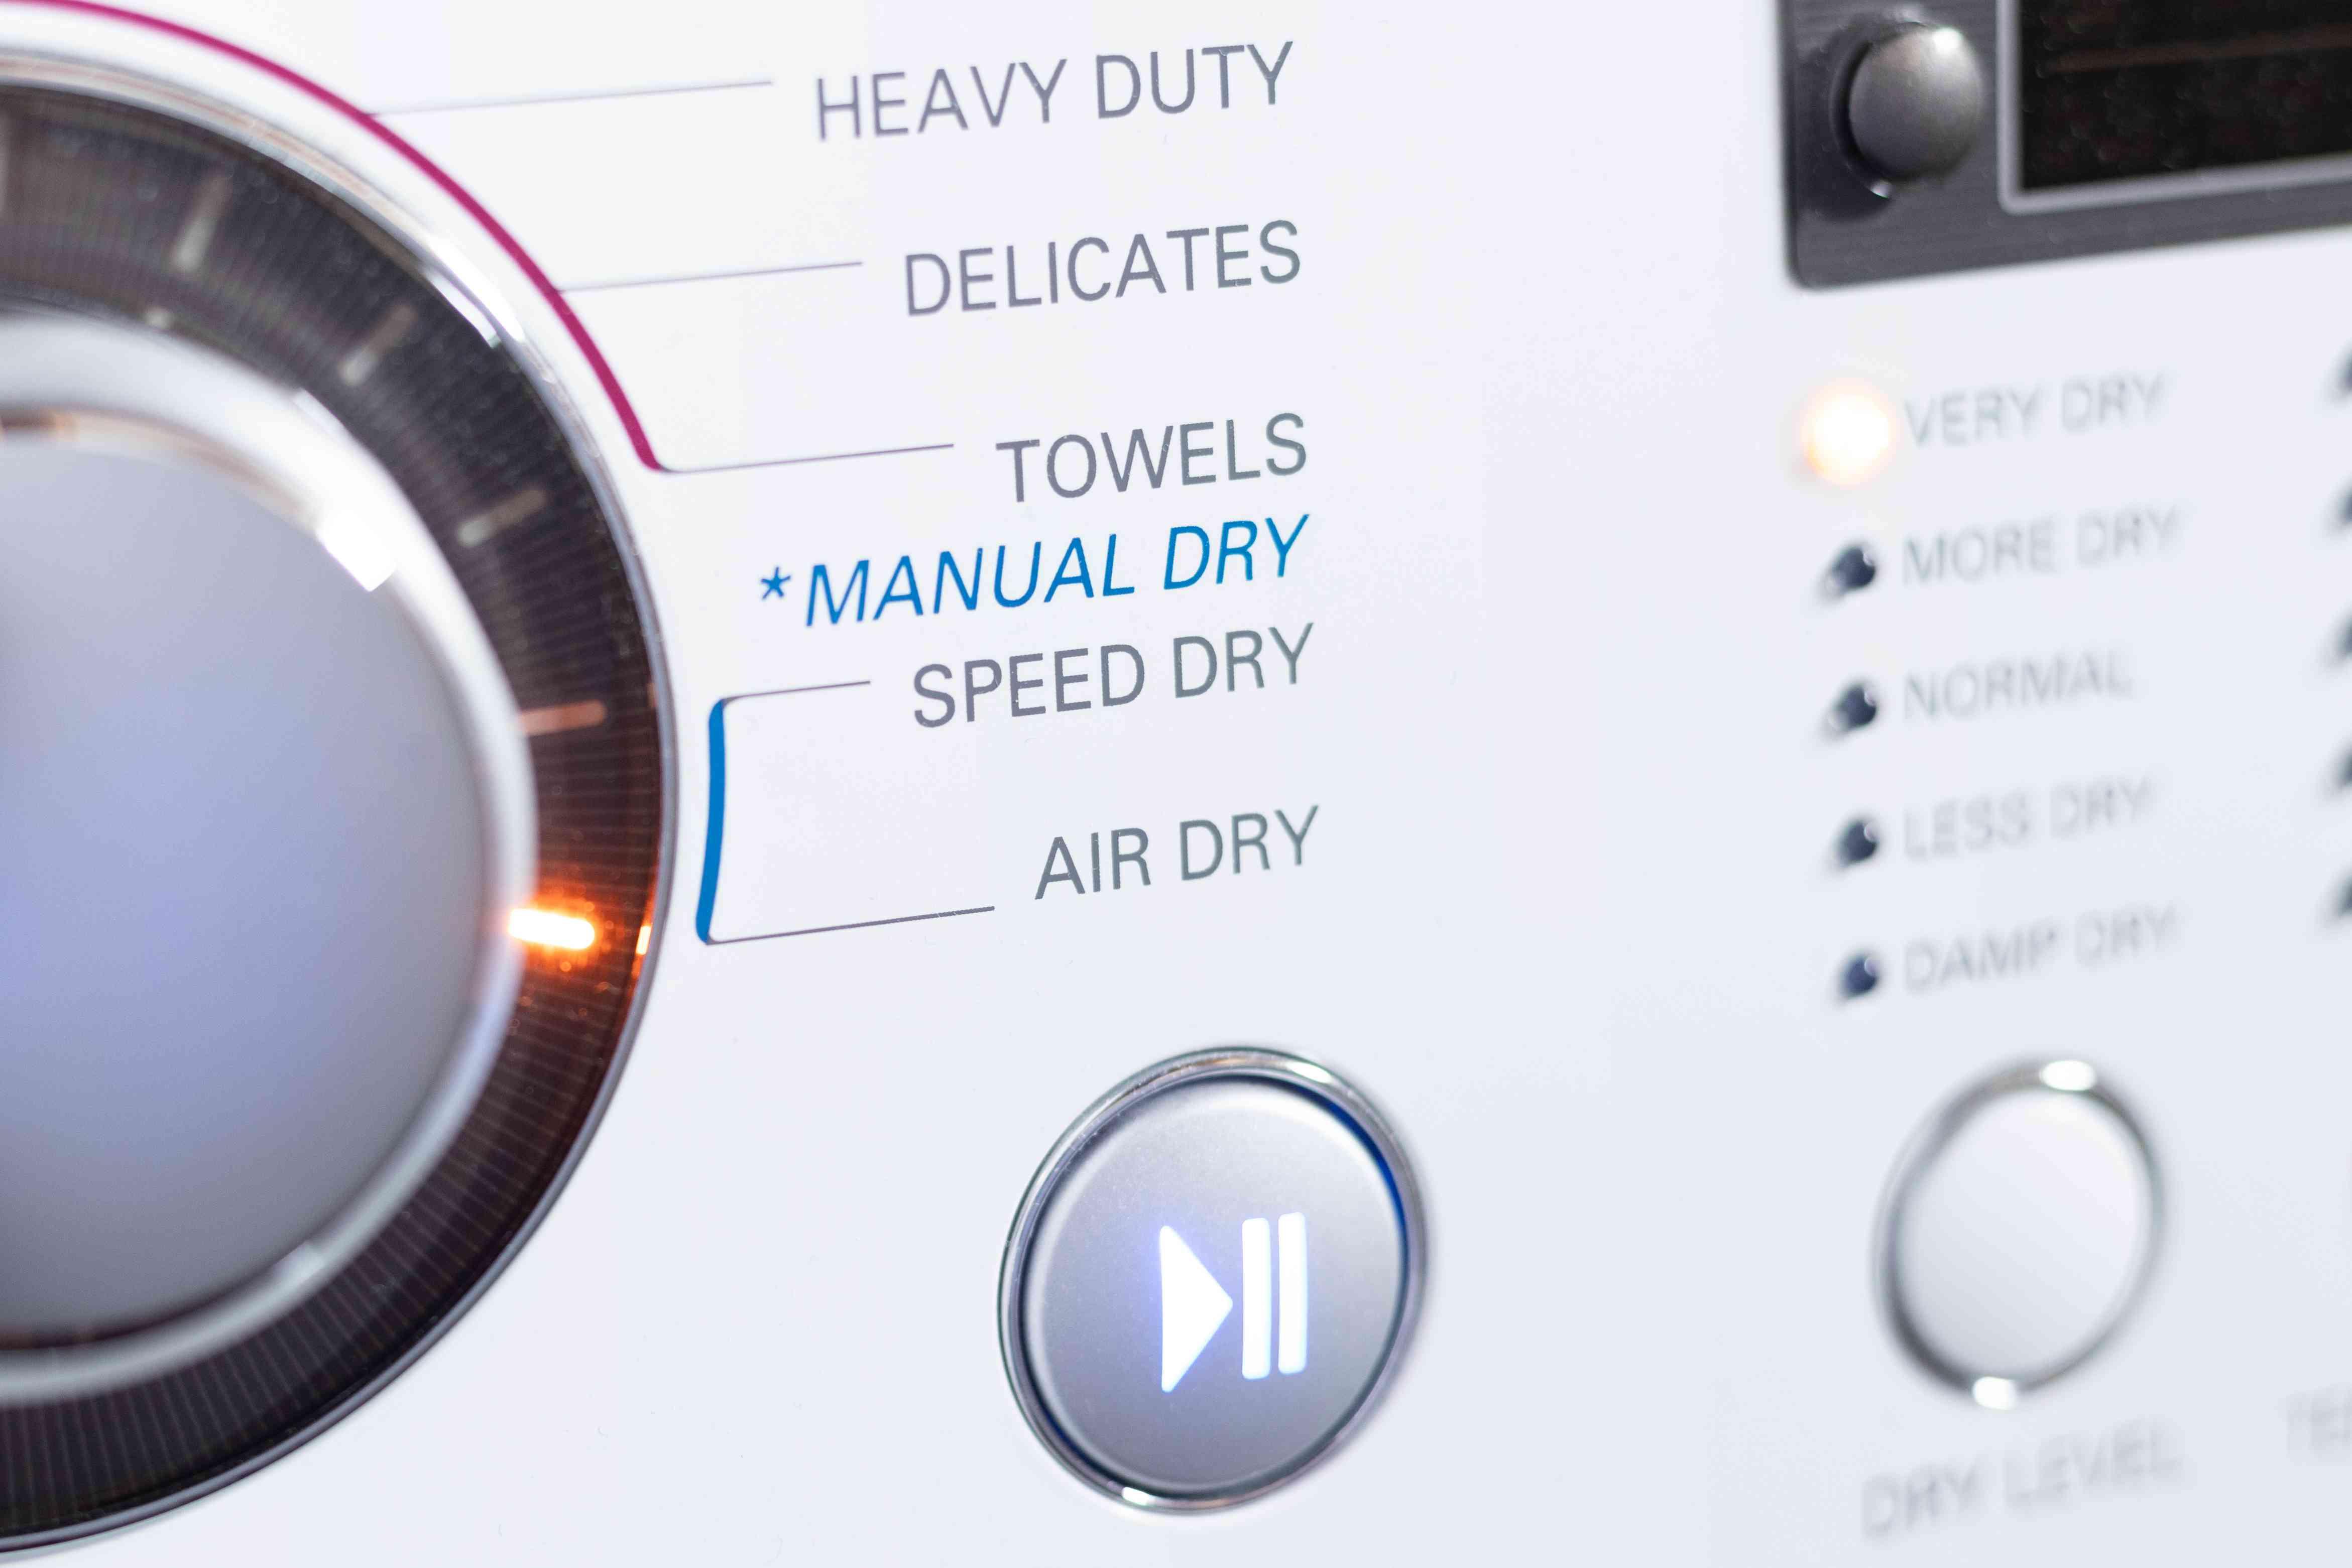 Dryer settings on air dry